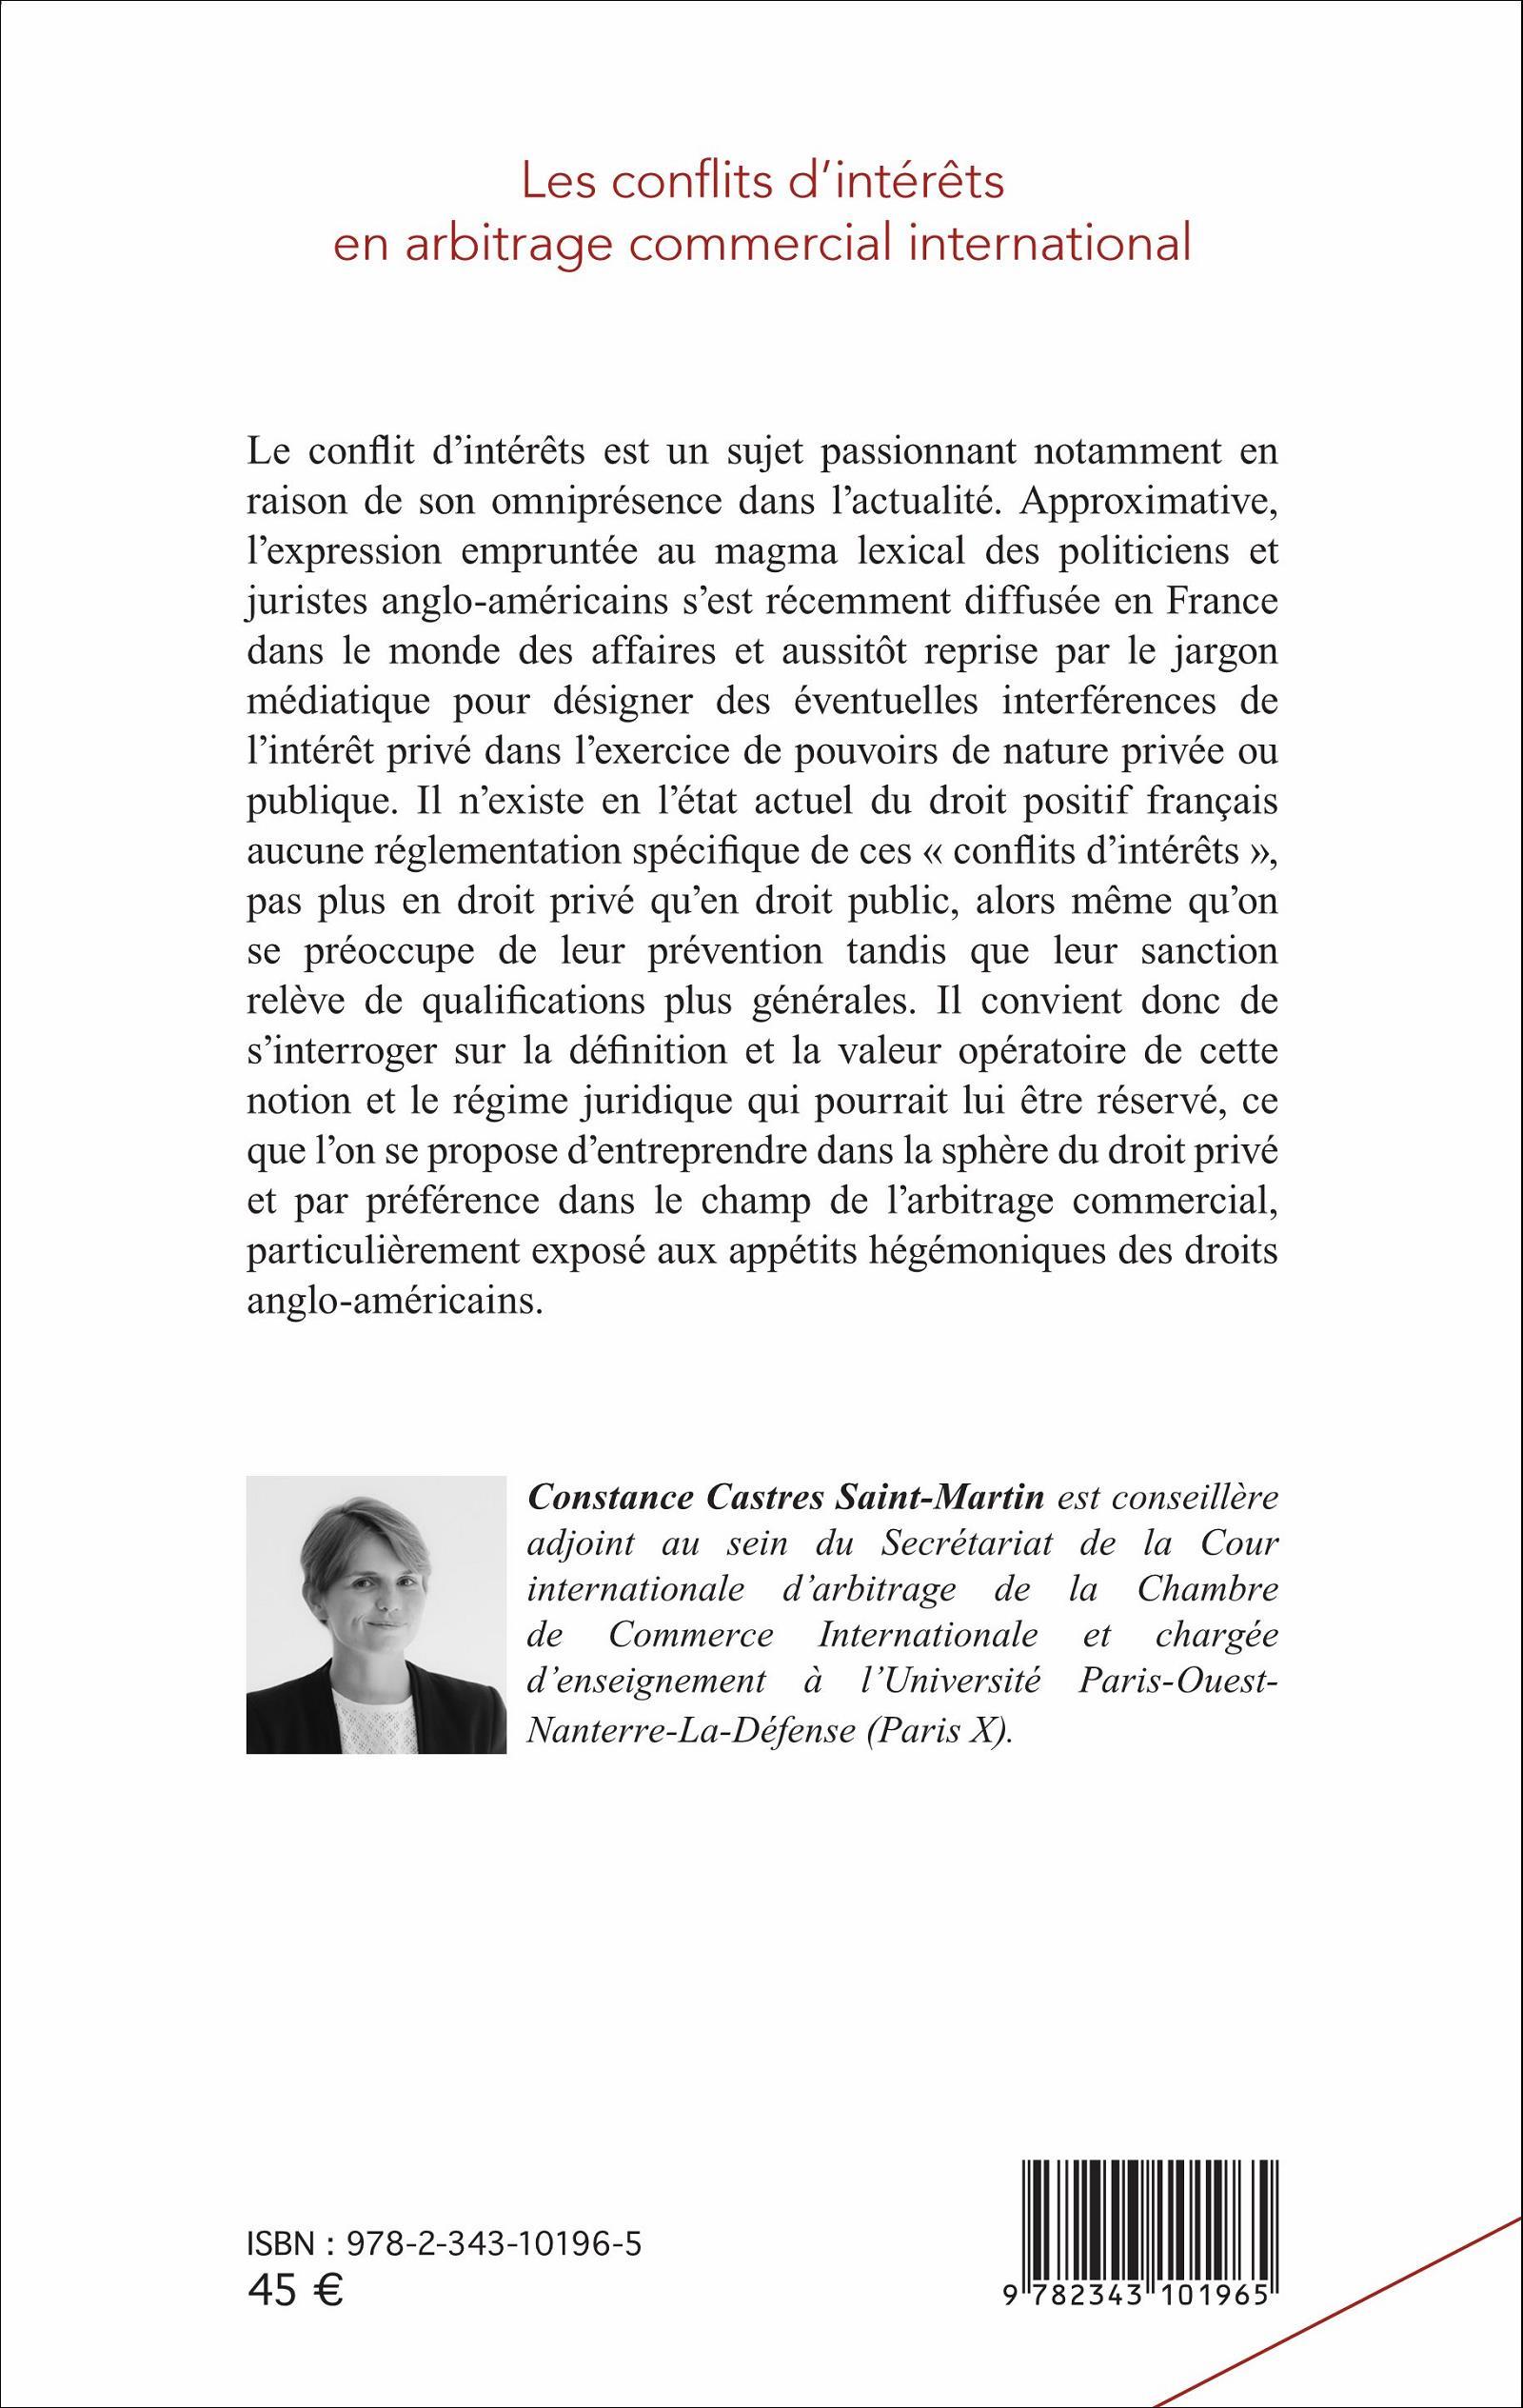 LES CONFLITS D INTéRŠTS EN ARBITRAGE MERCIAL INTERNATIONAL